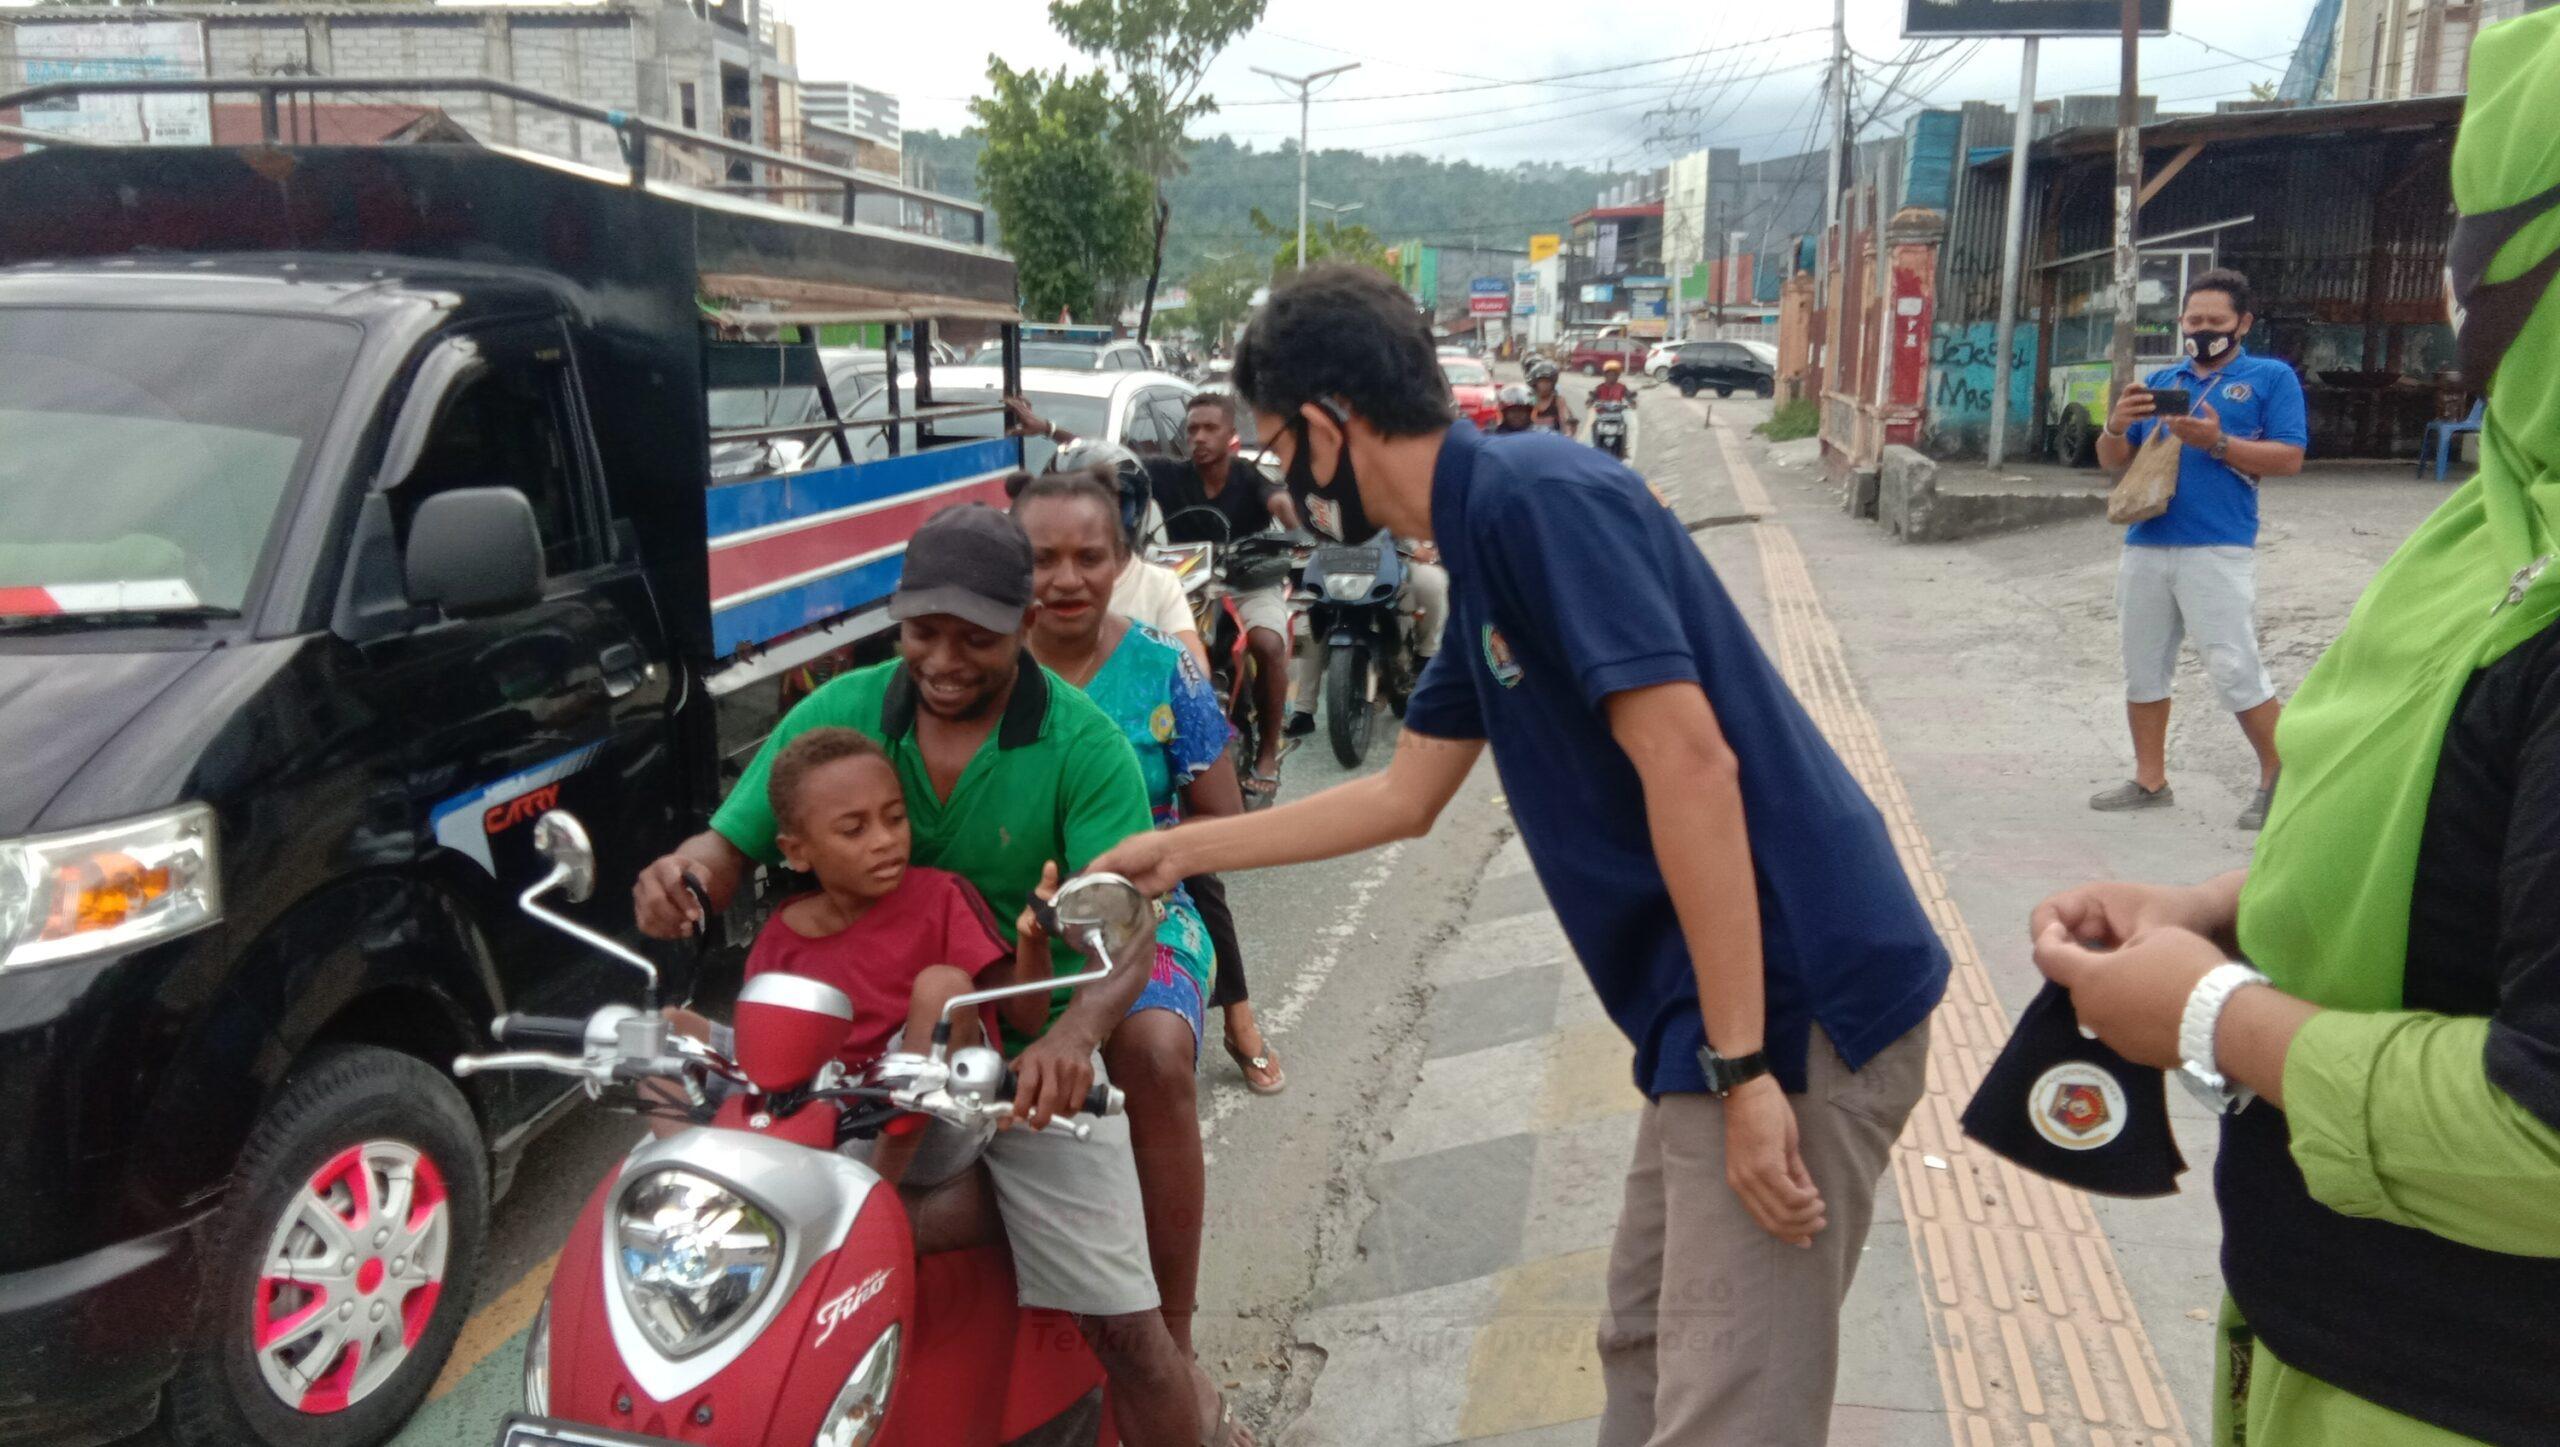 PWI Papua Barat Bagi 1000 Masker di Manokwari 1 IMG 20210207 WA0108 1 scaled